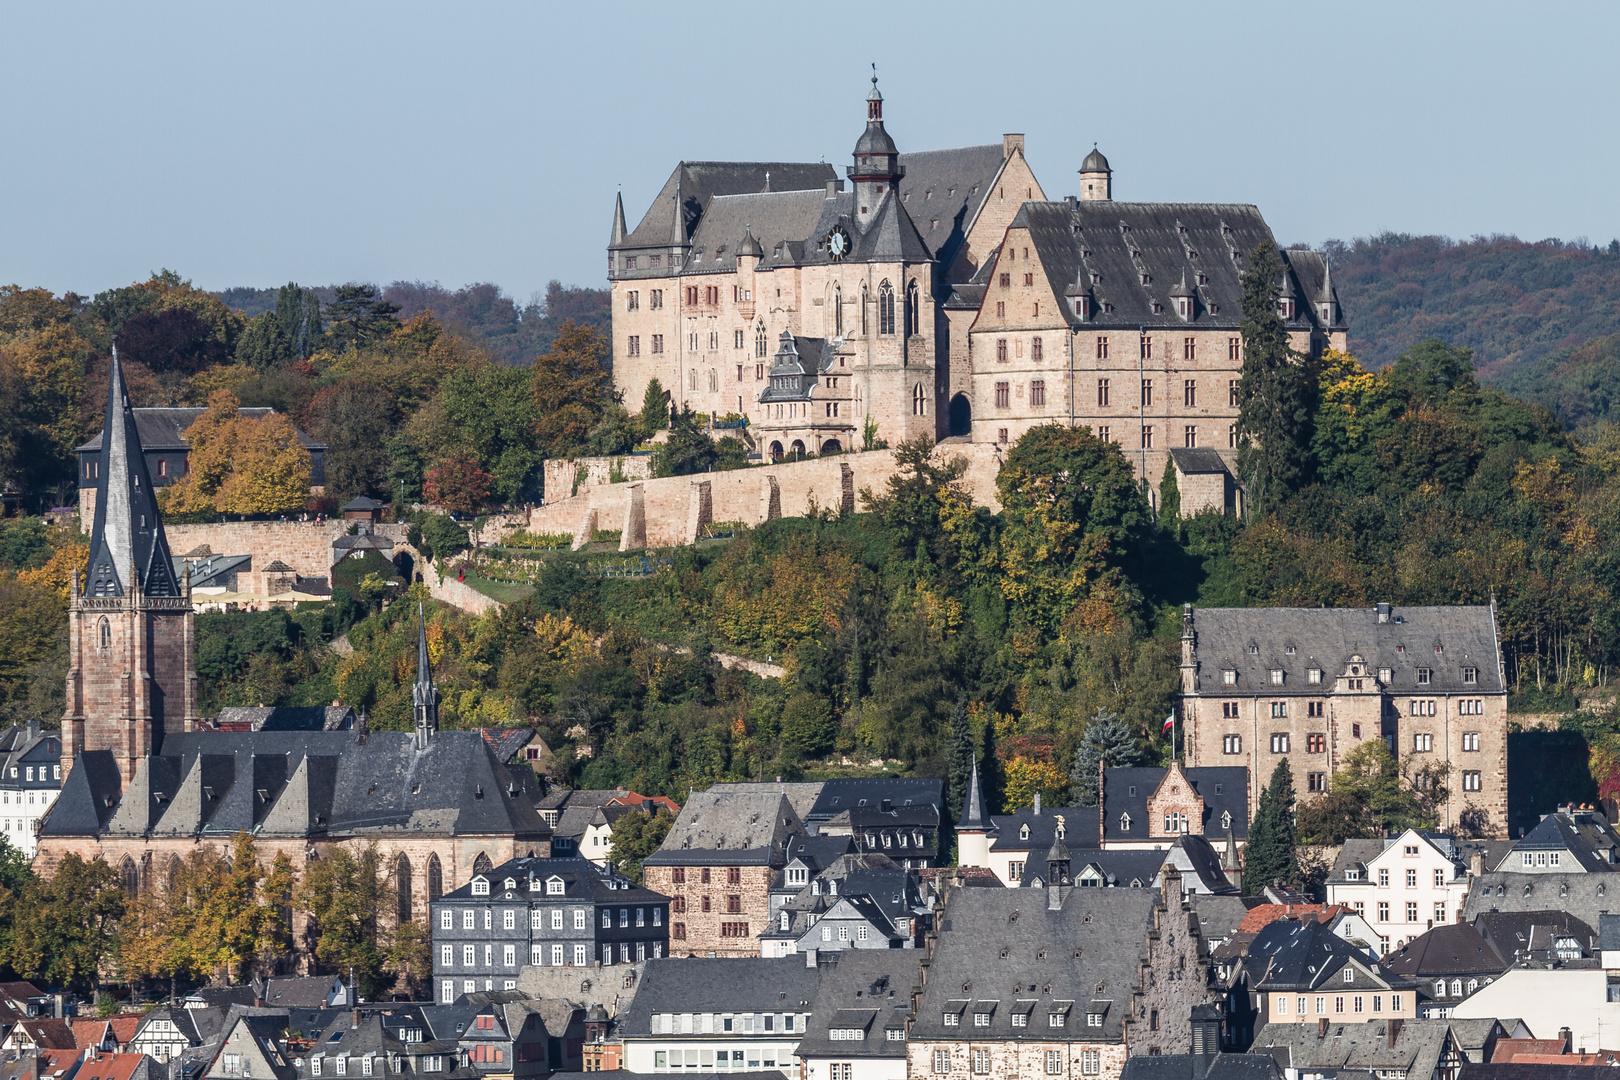 Landgrafenschloss Marburg